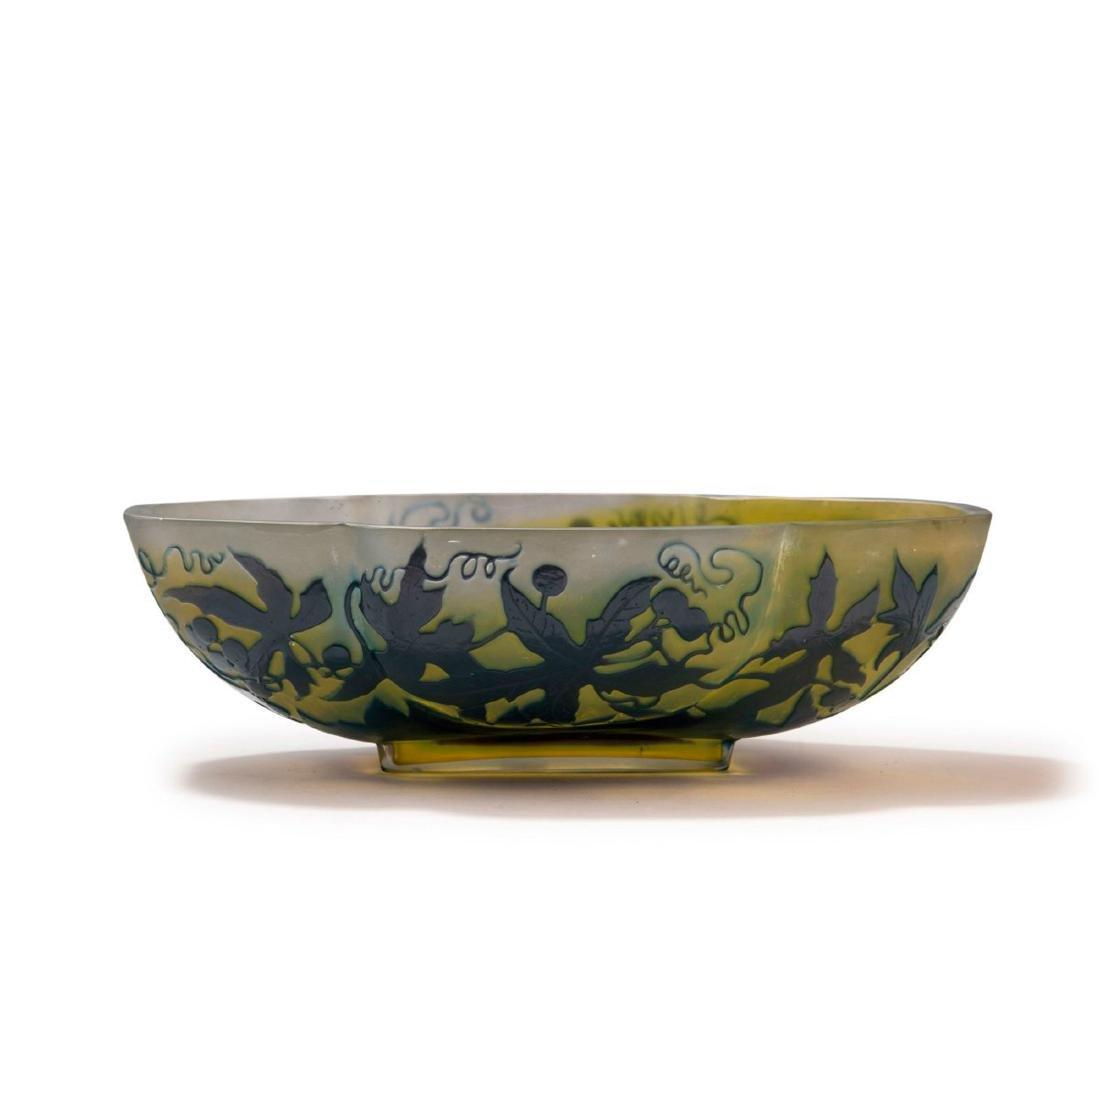 'Vigne vierge' bowl, 1906-14 - 2